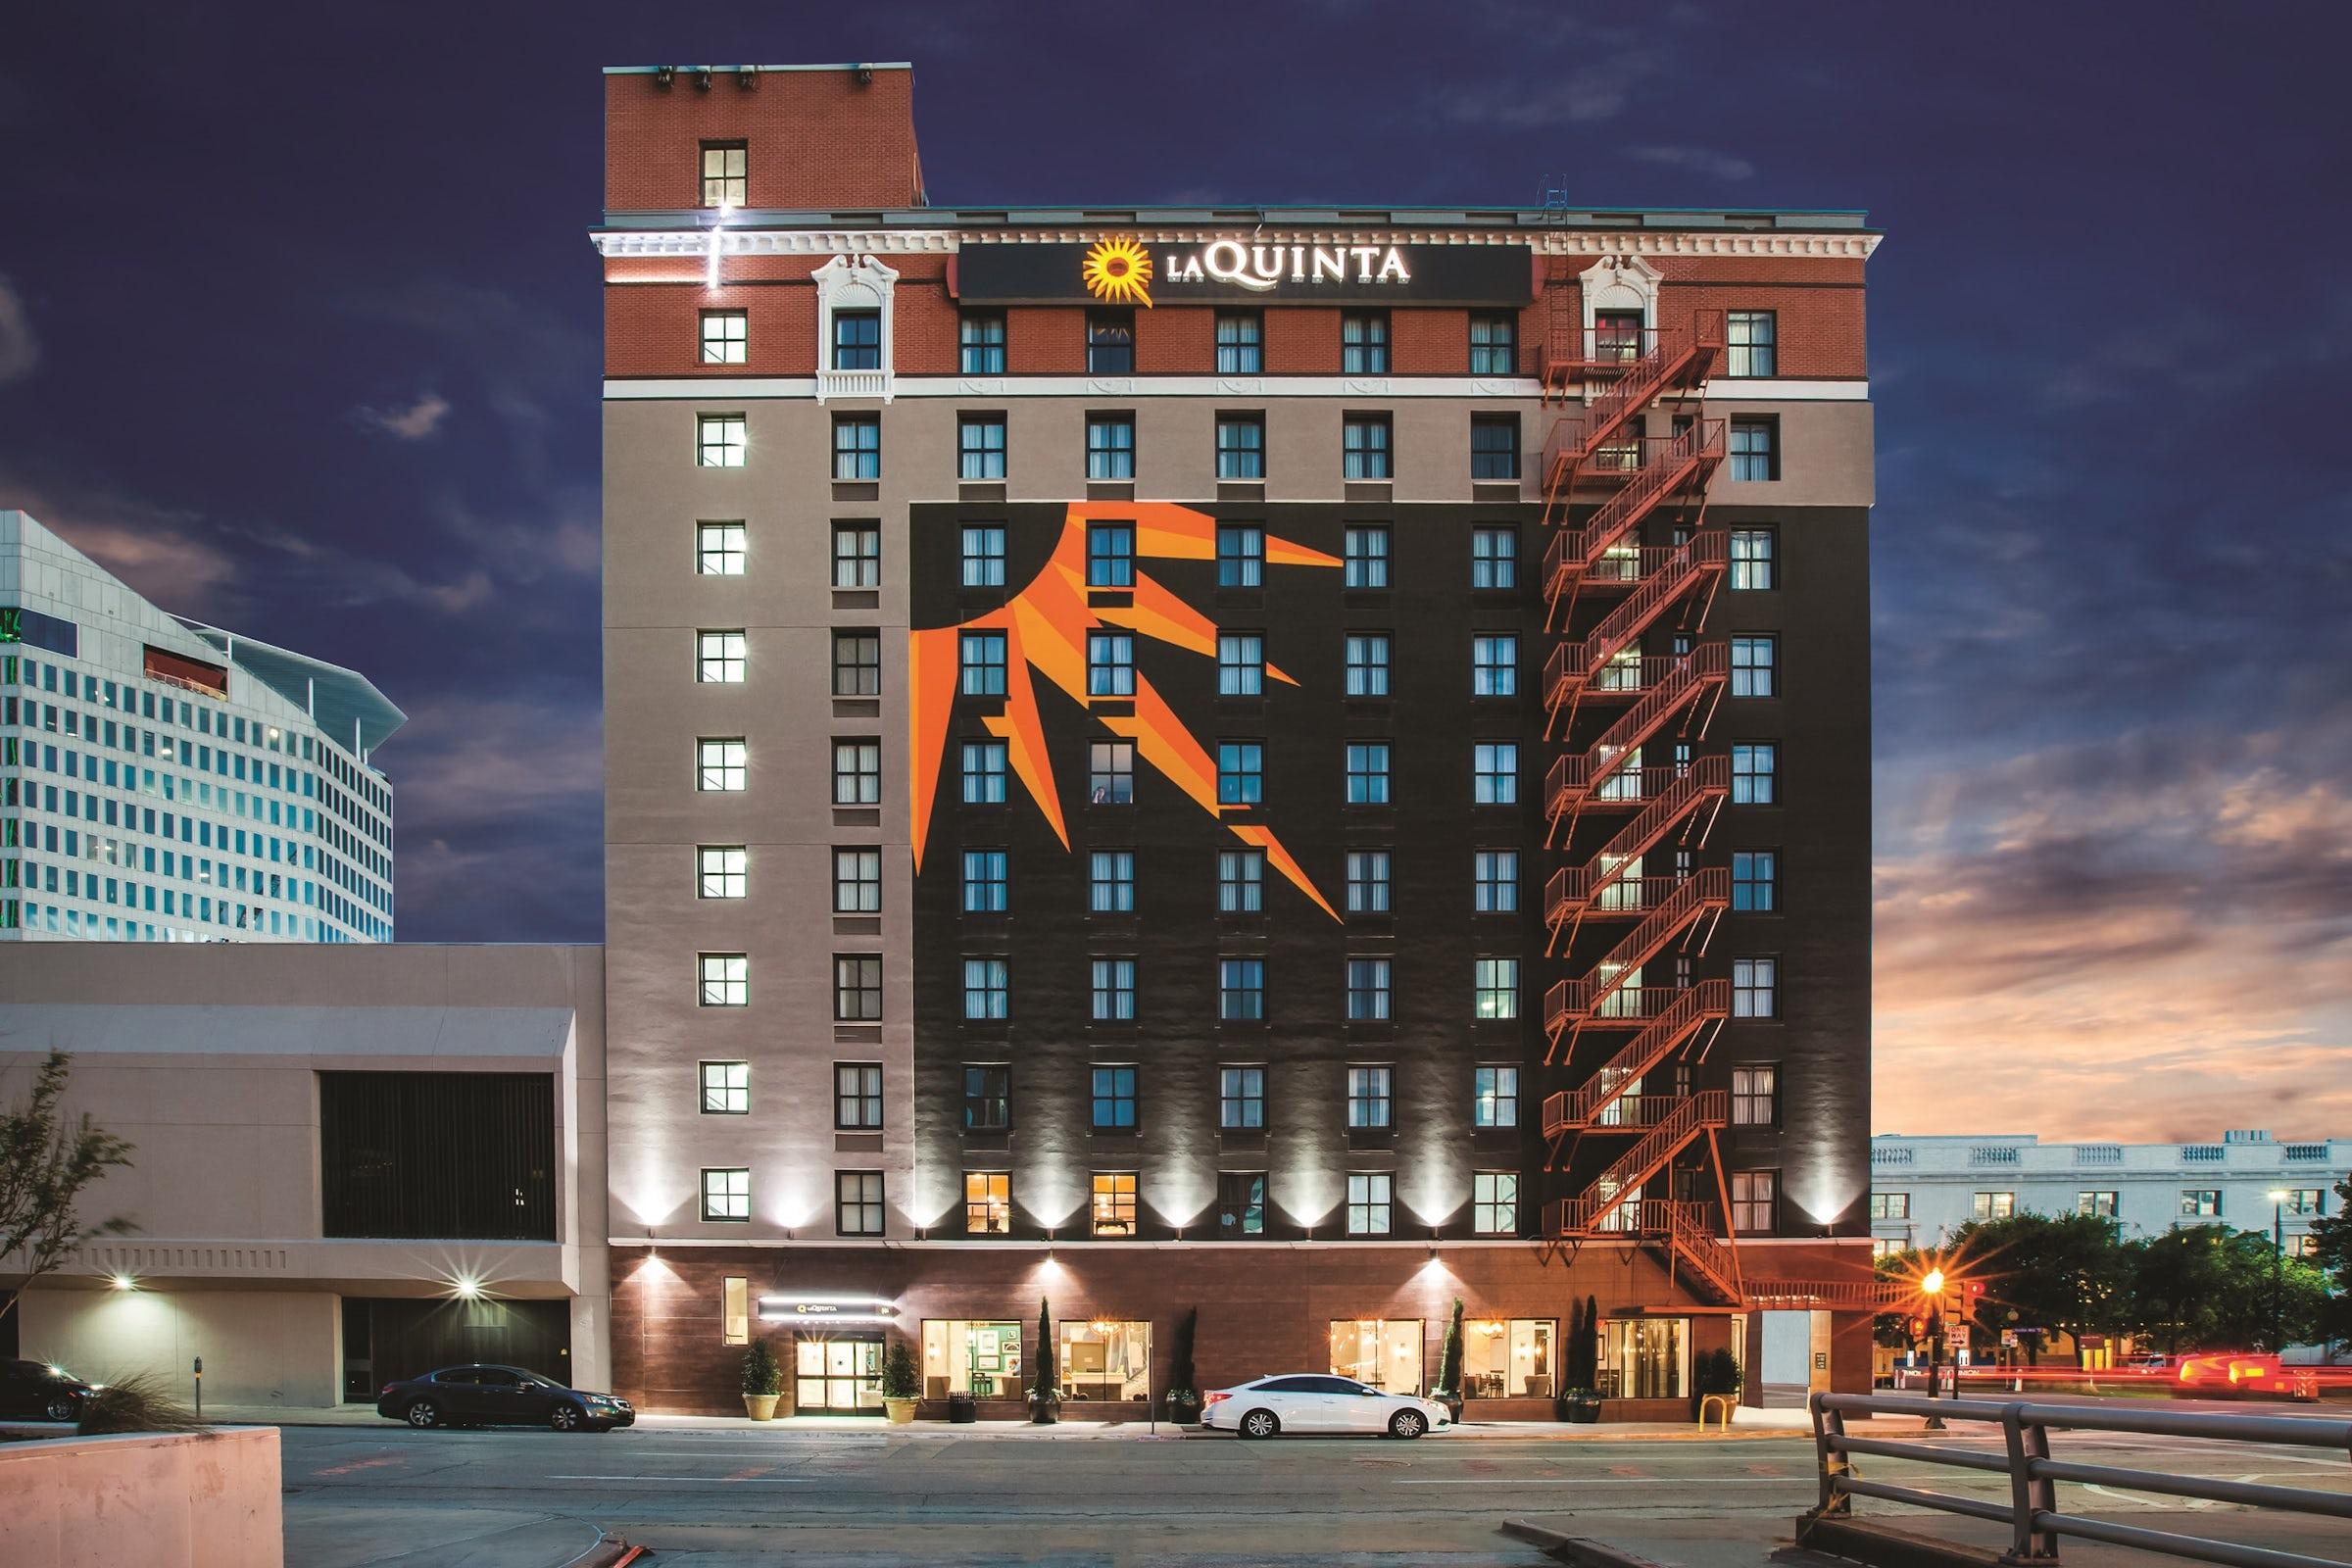 La Quinta Inn & Suites Dallas Downtown in Beyond Dallas